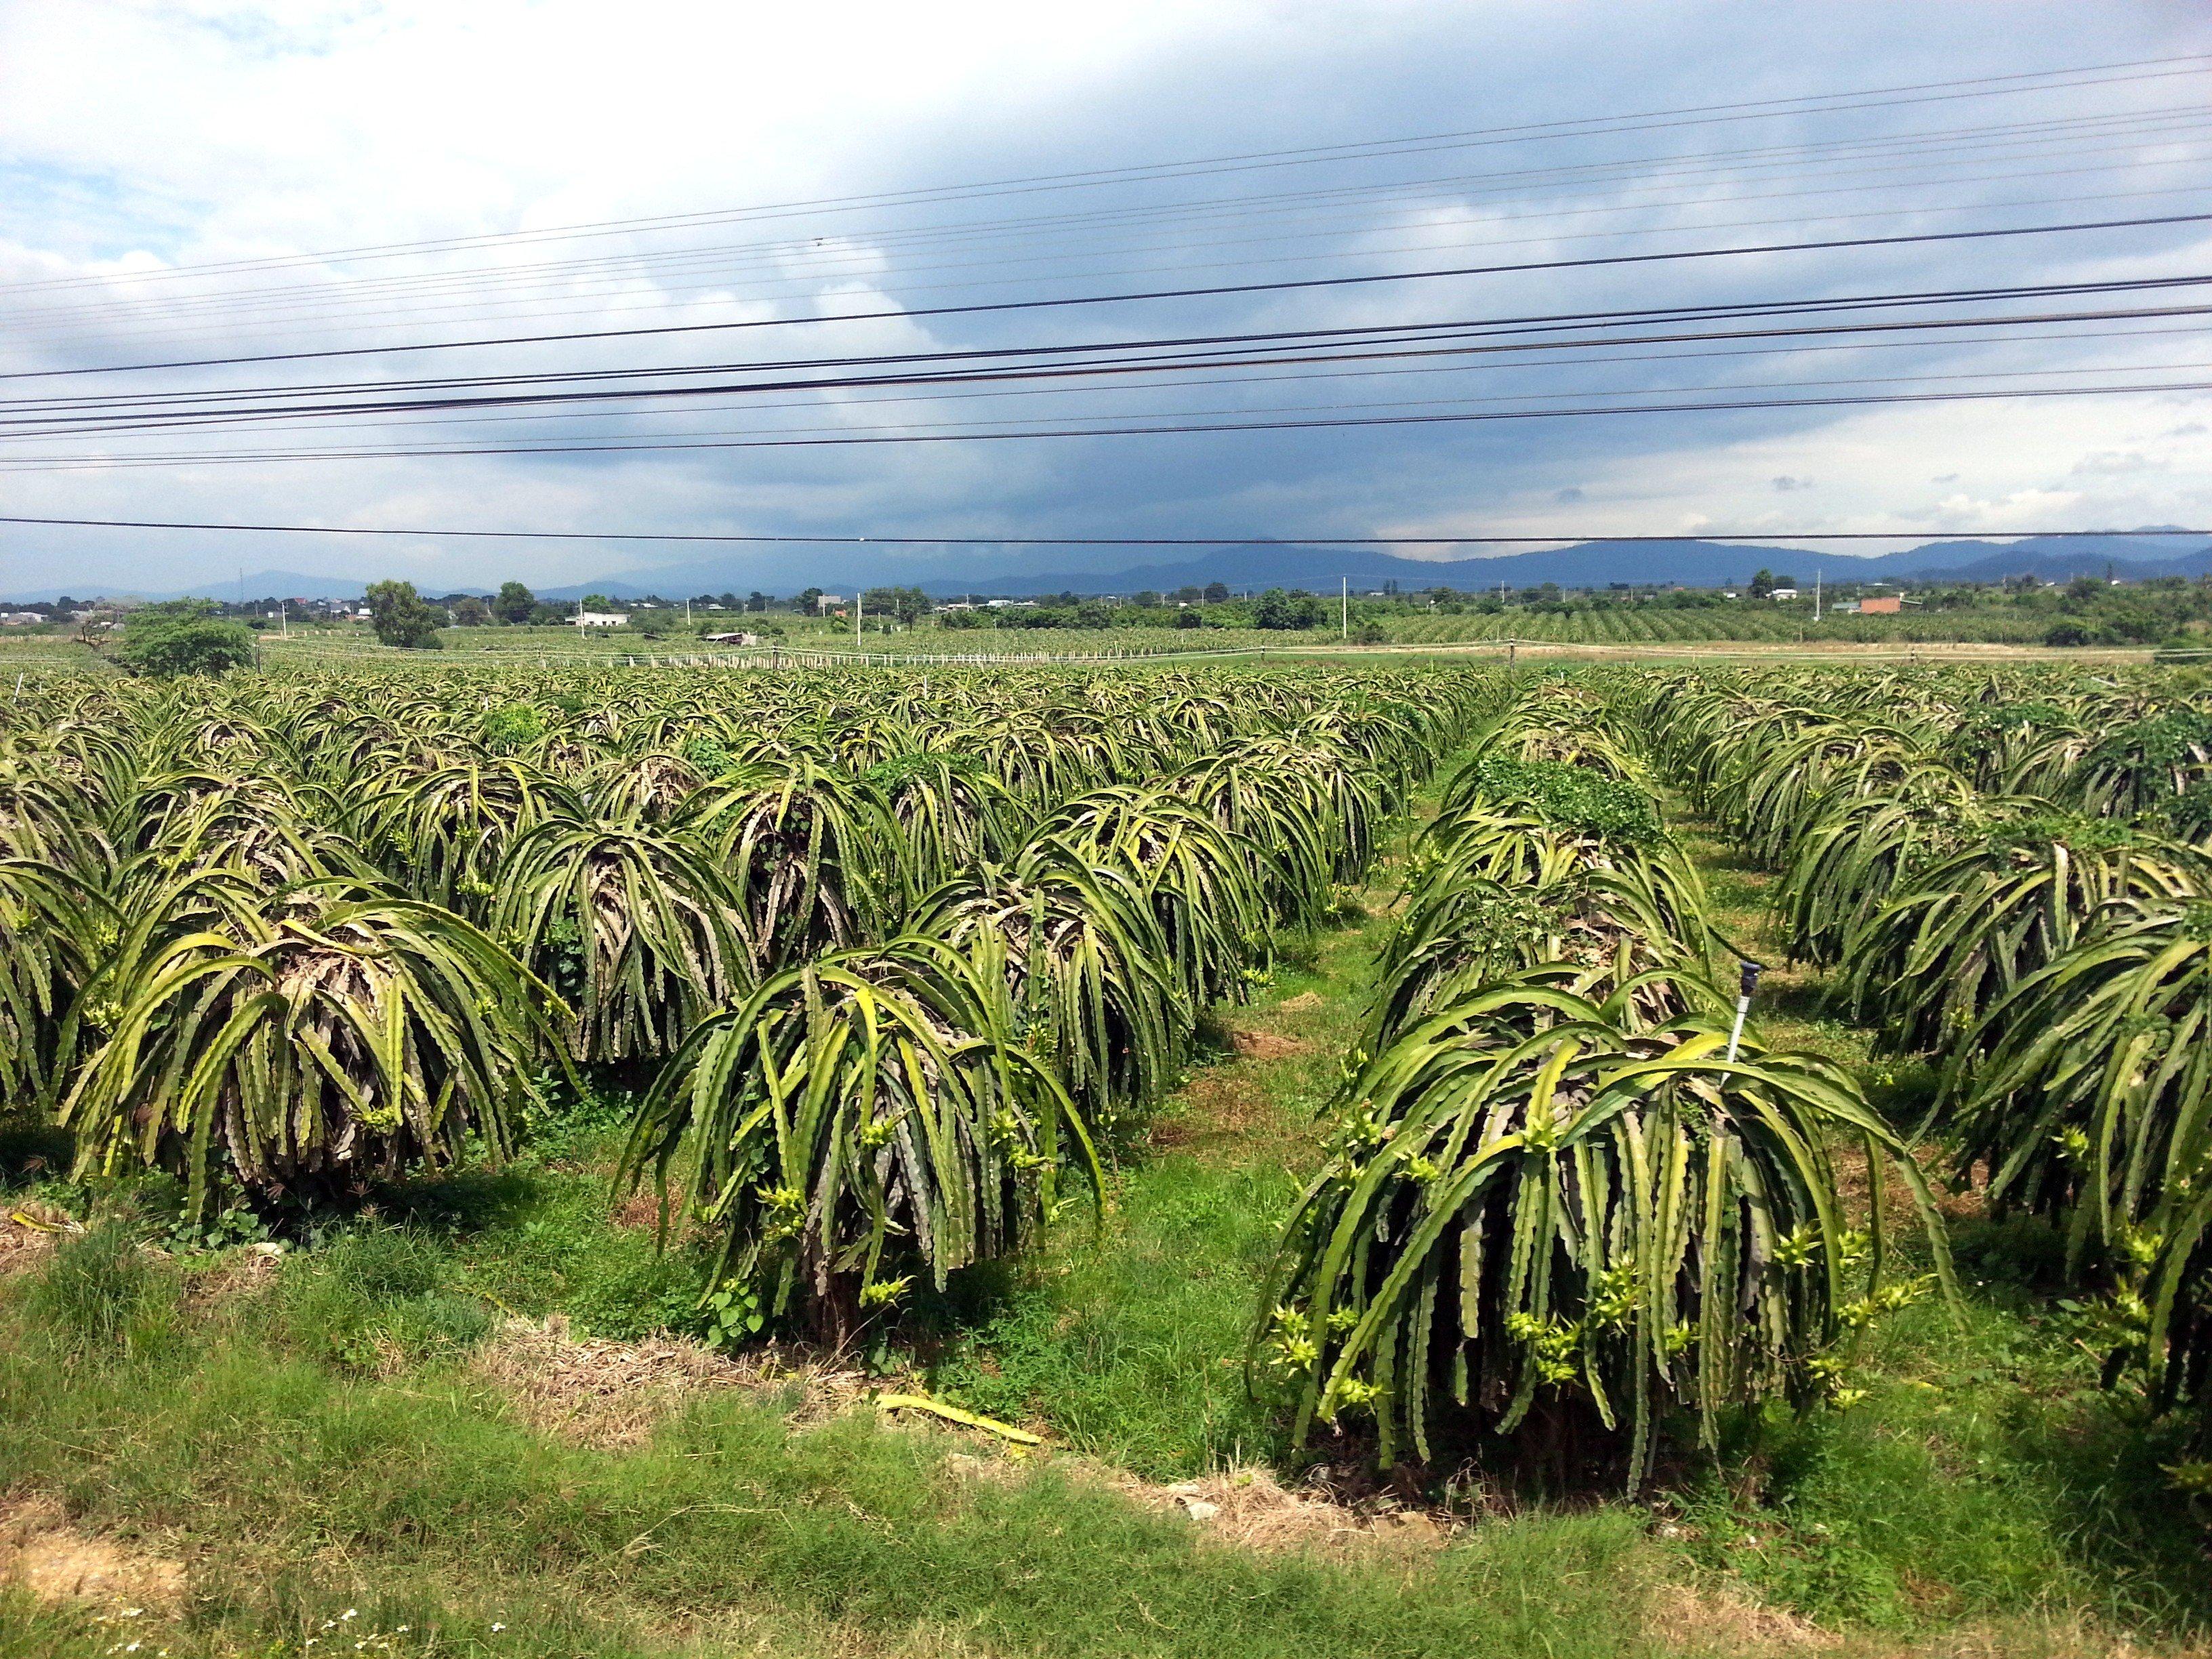 Farmland on the way to Nha Trang